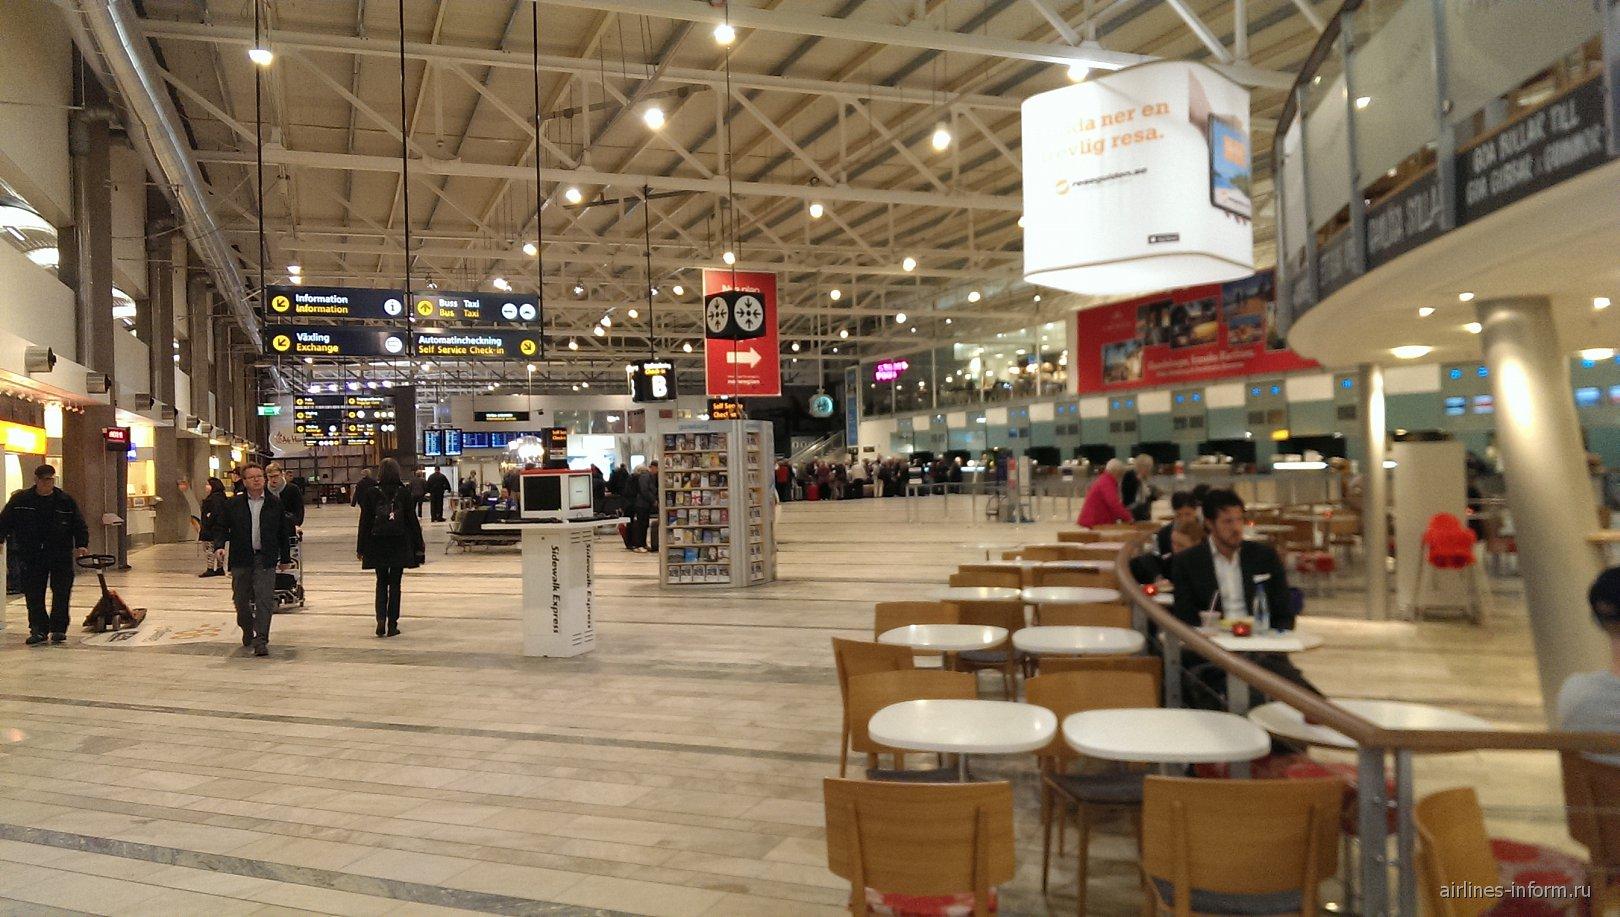 В аэровокзале аэропорта Гётеборг Ландветтер